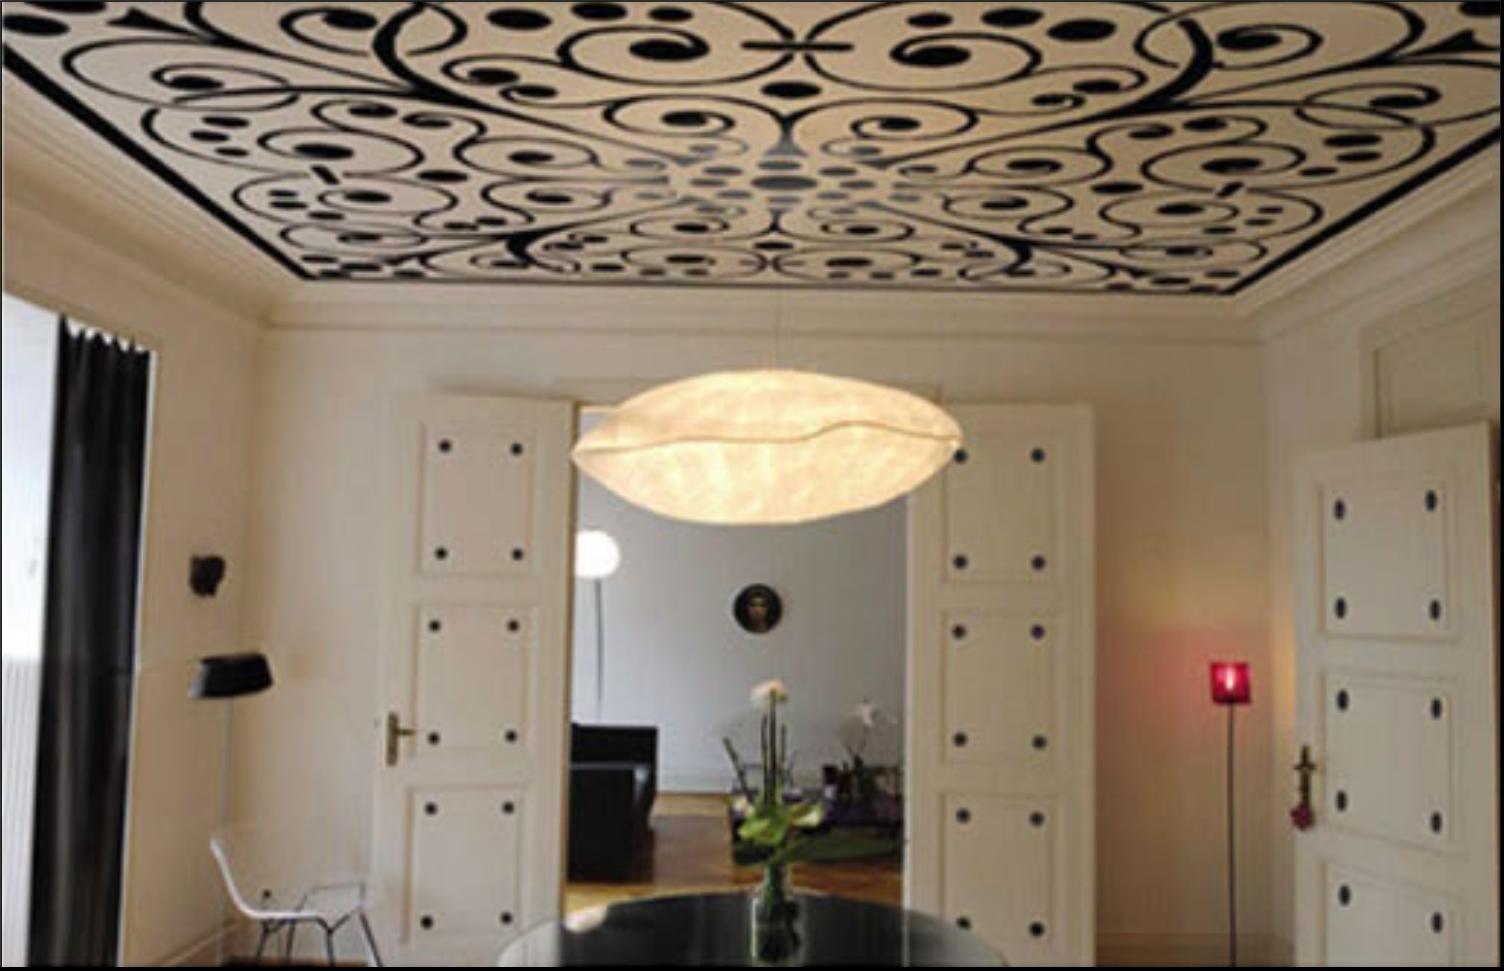 plafond suspendu yvelines lyon devis construction maison container soci t onsvl. Black Bedroom Furniture Sets. Home Design Ideas